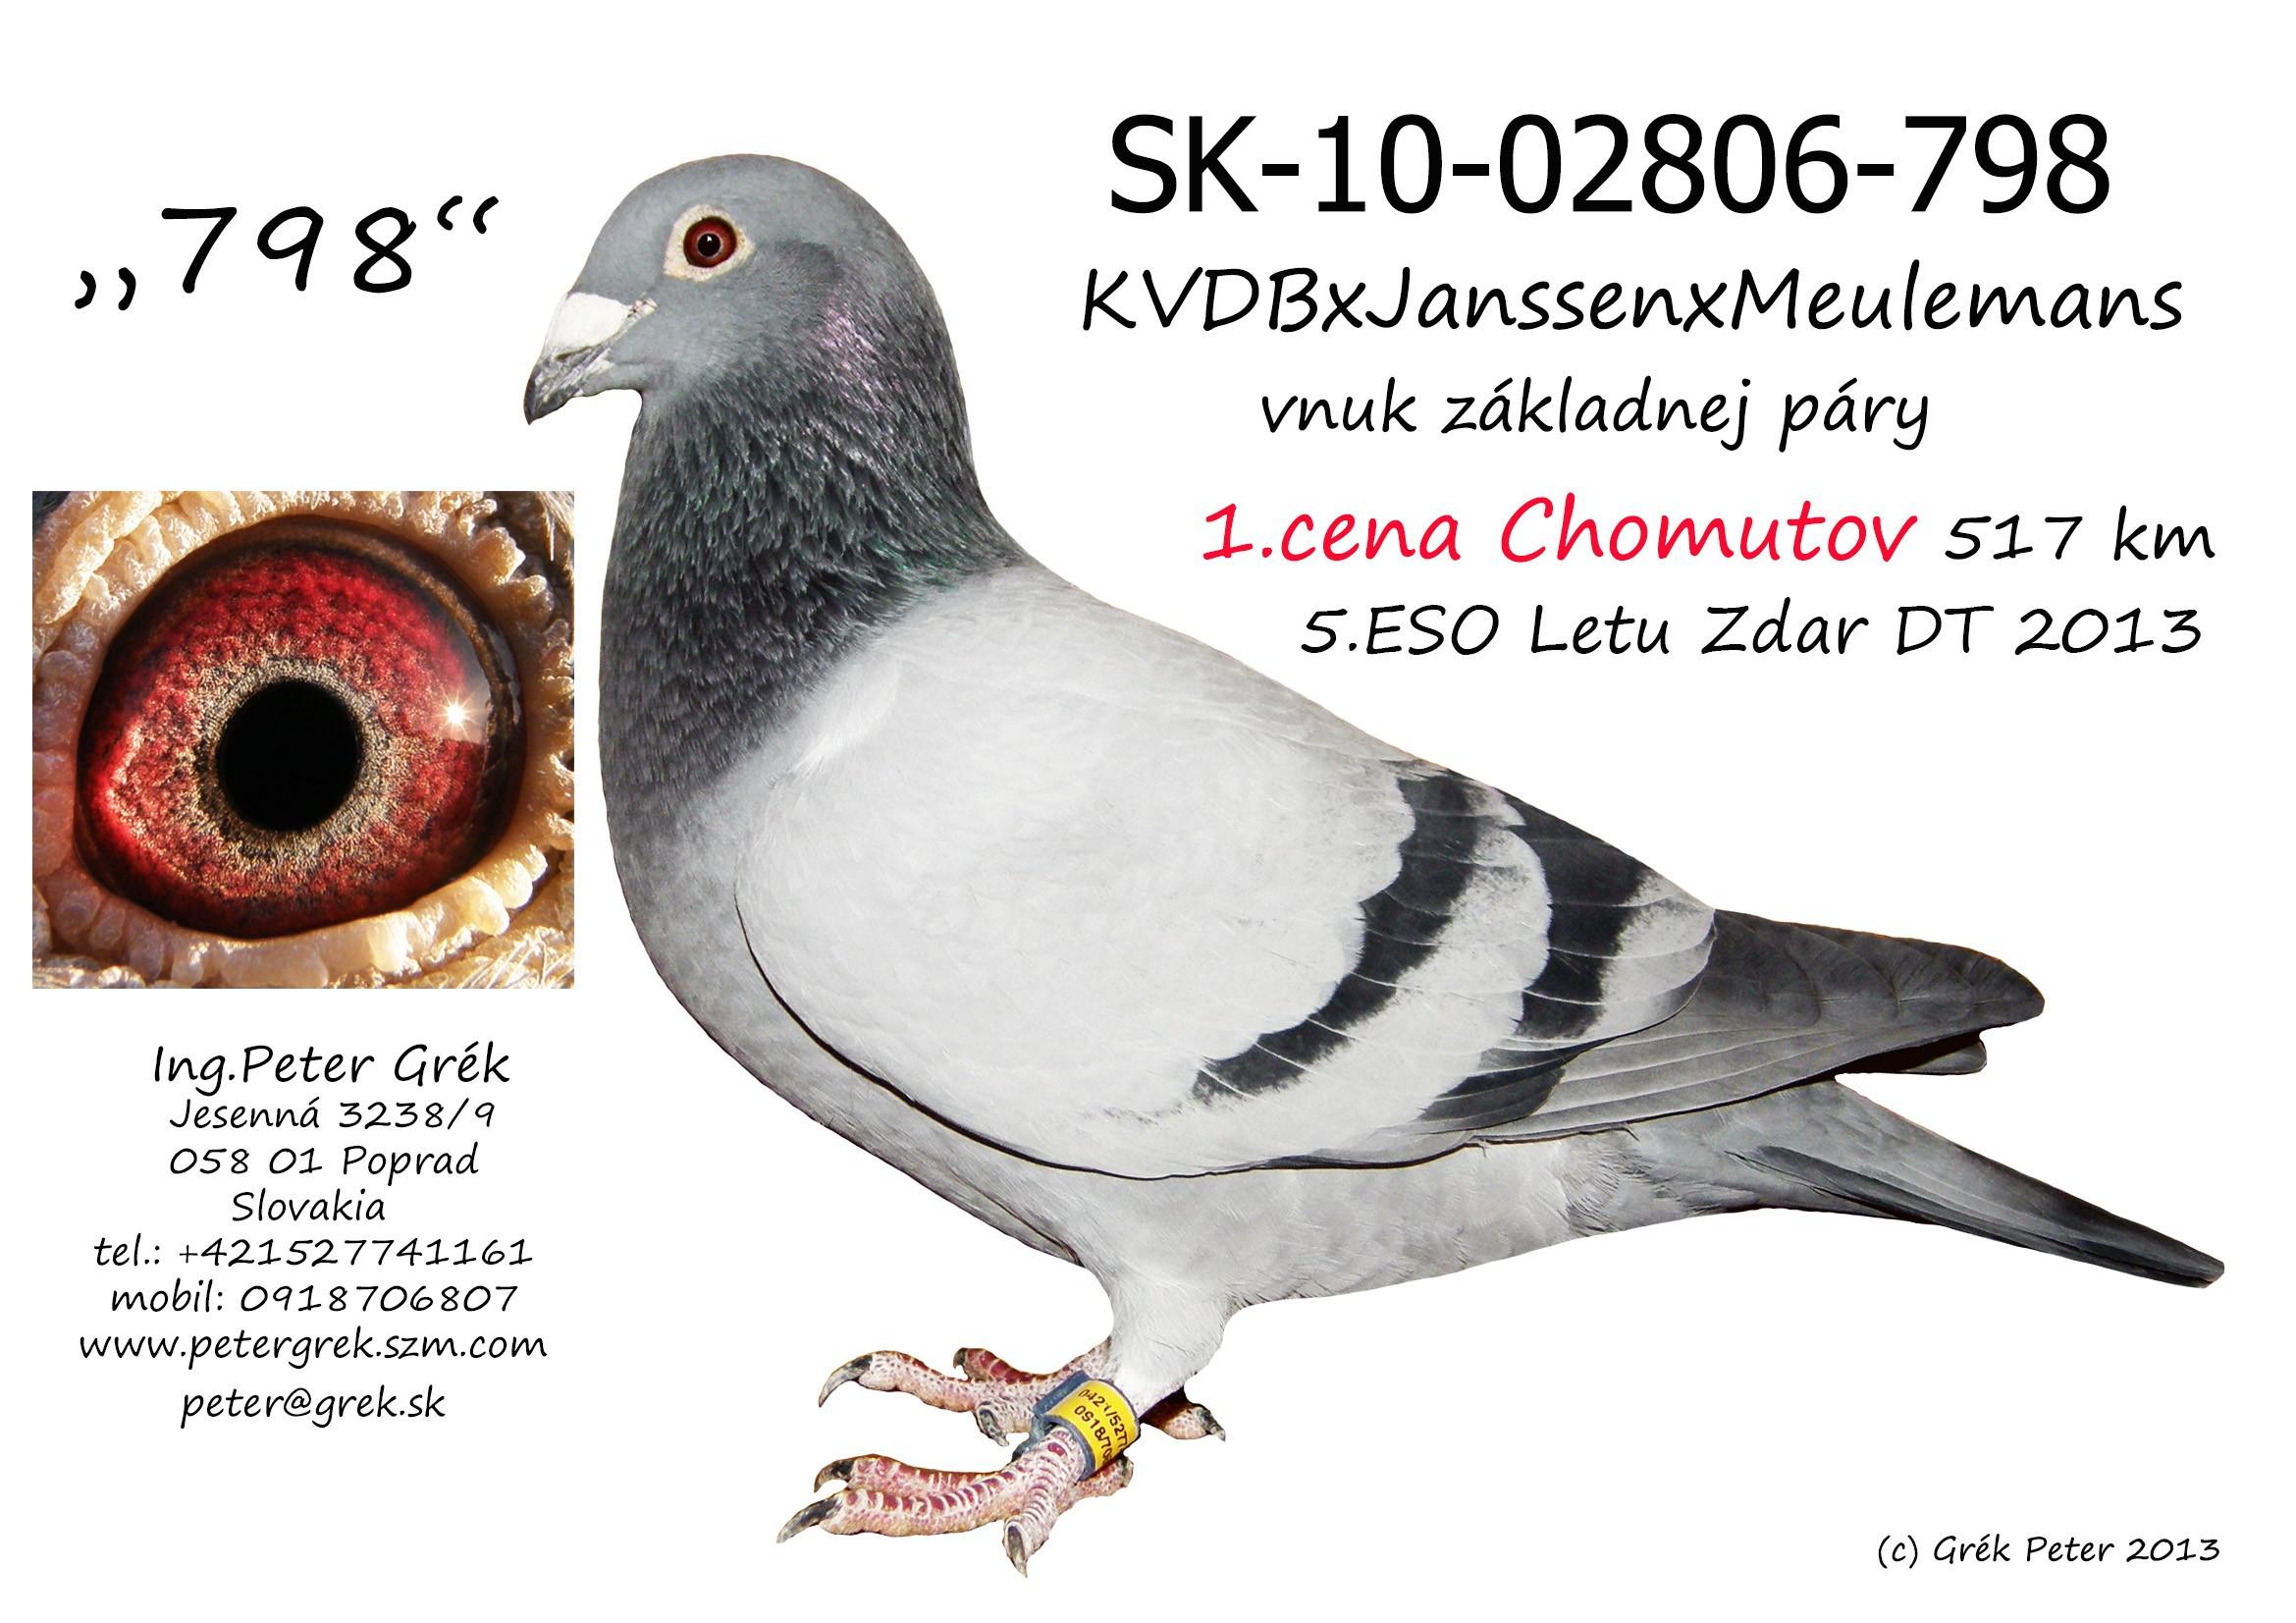 SK-2010-02806-798